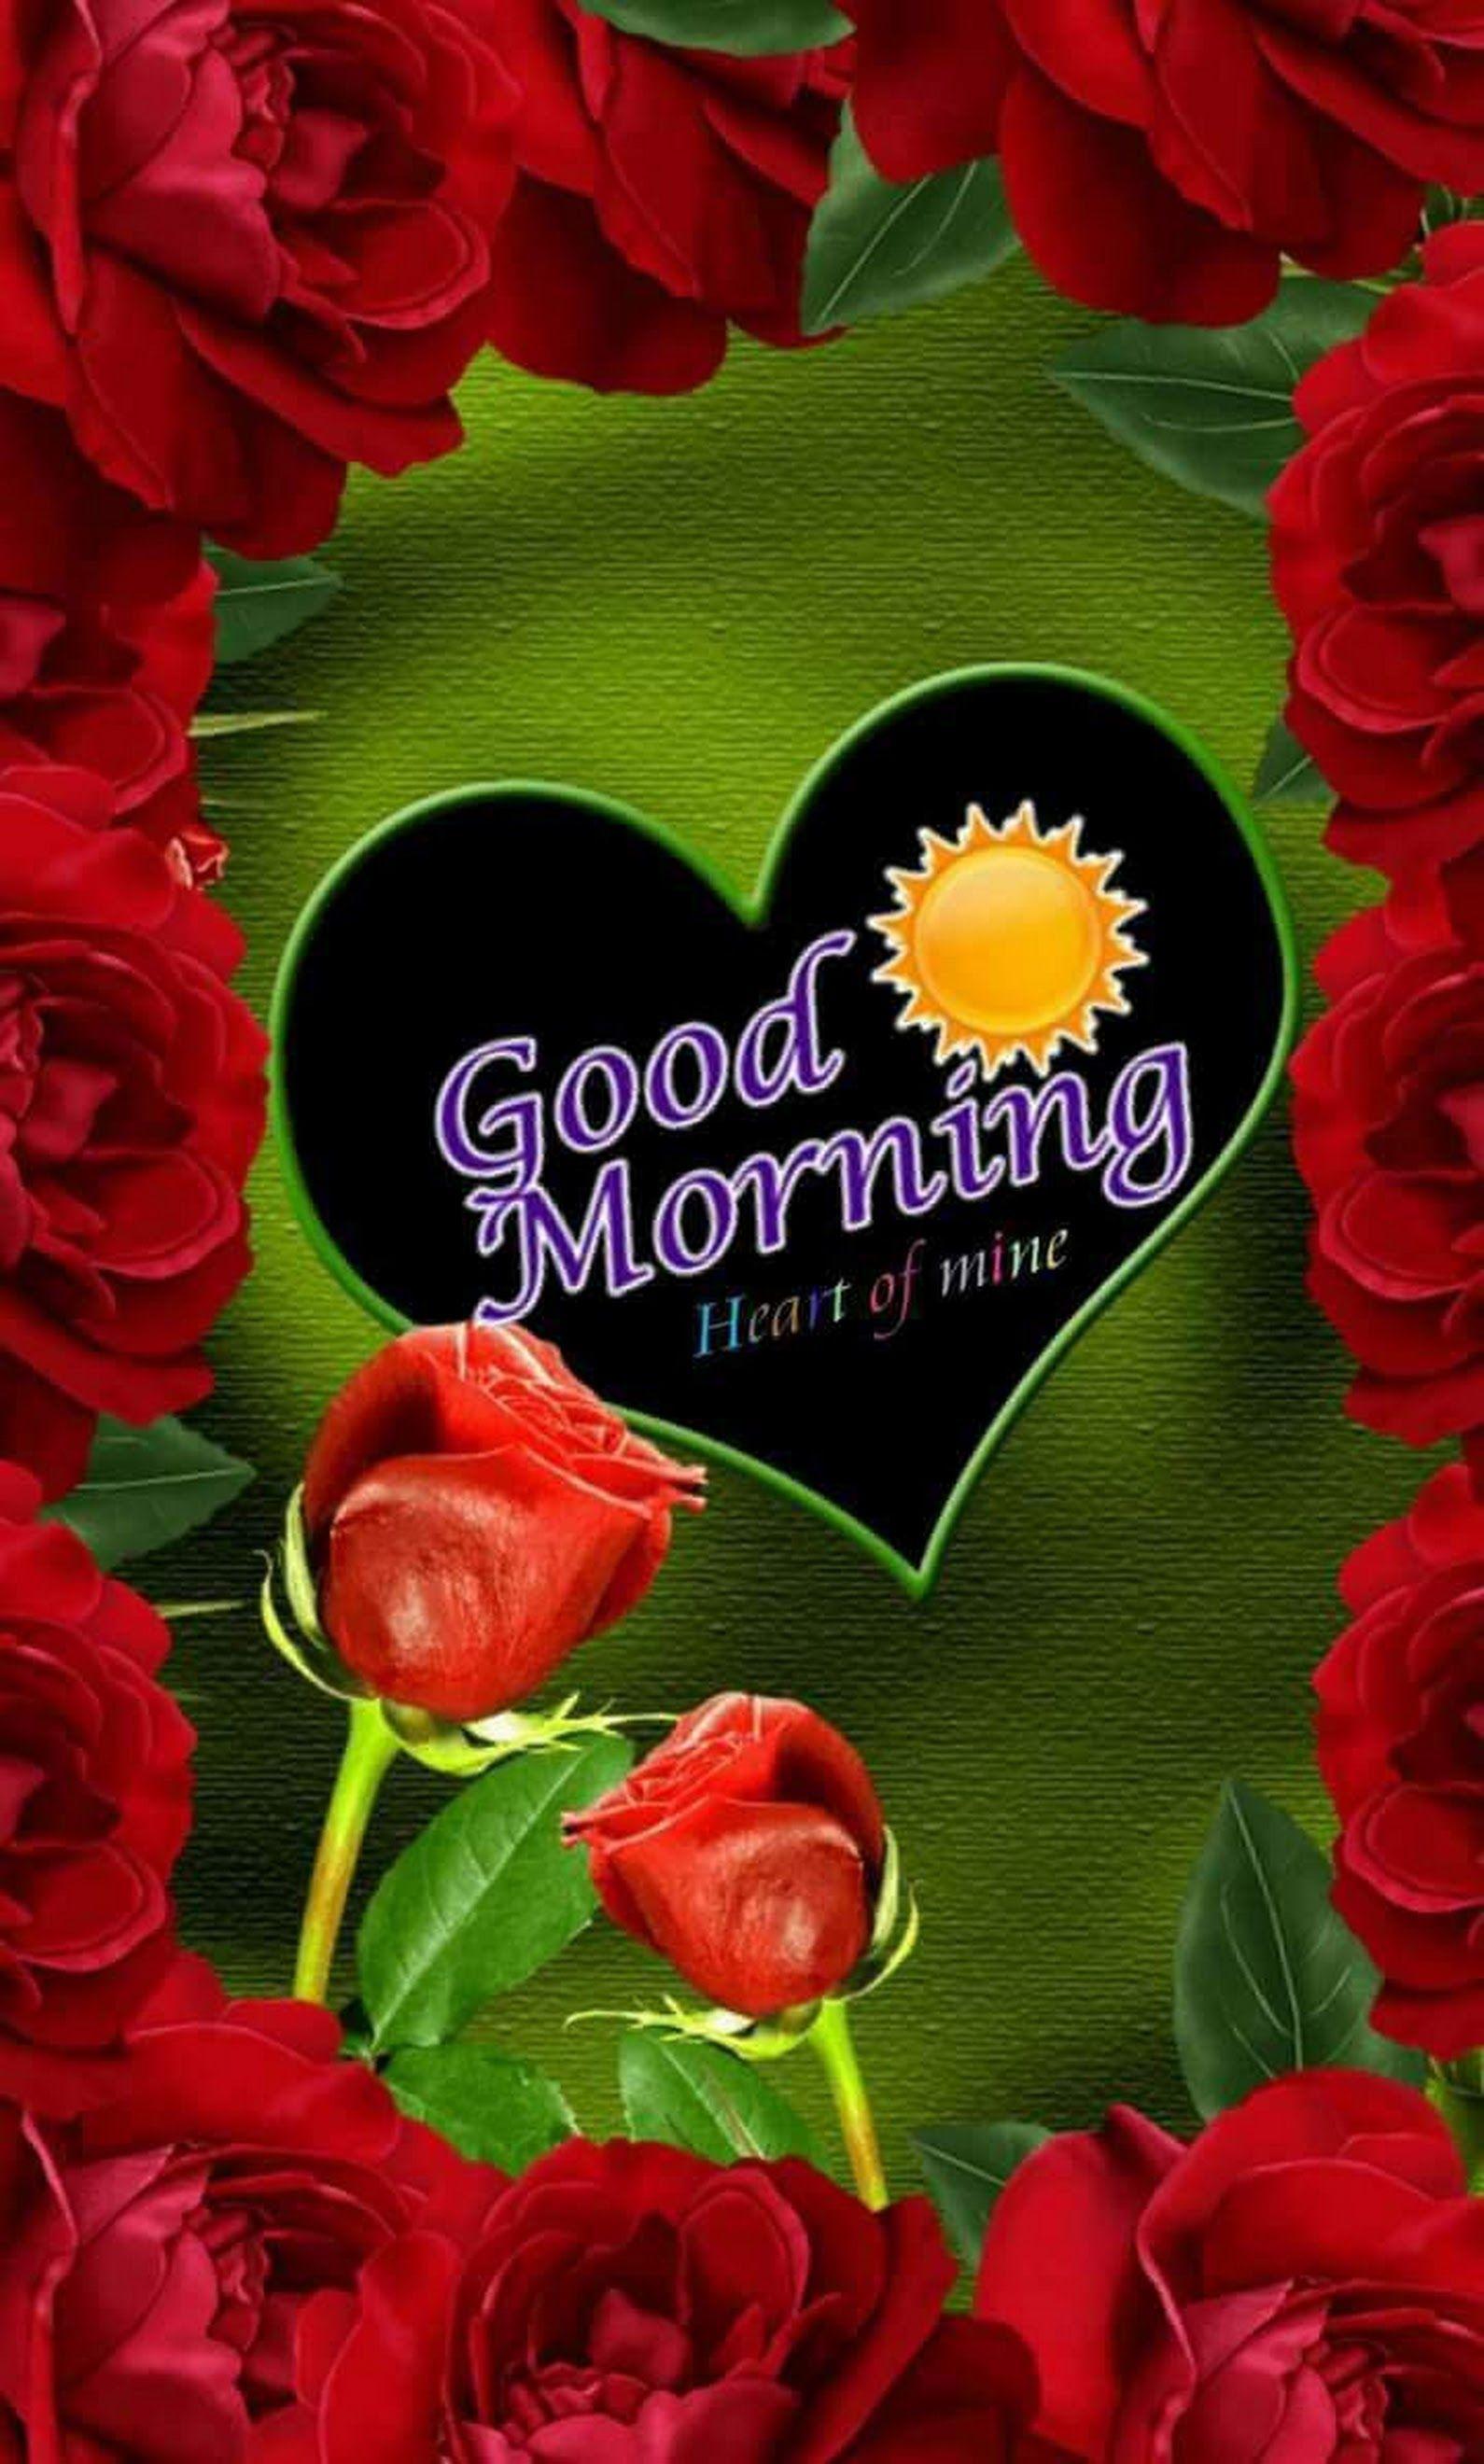 Pin By Tam Tam On Morningday Greeting Pinterest Good Morning